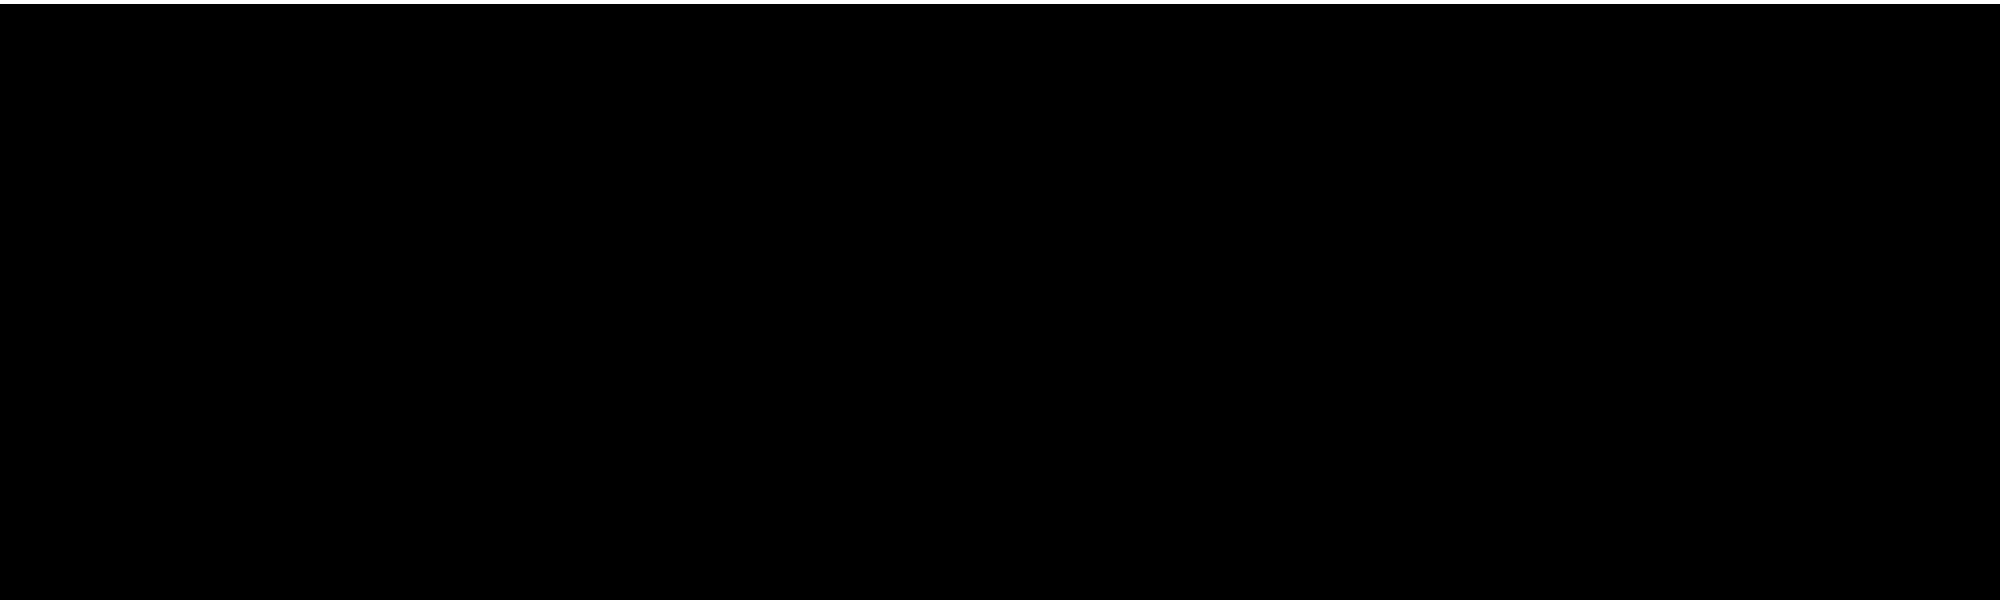 bg-prefooter